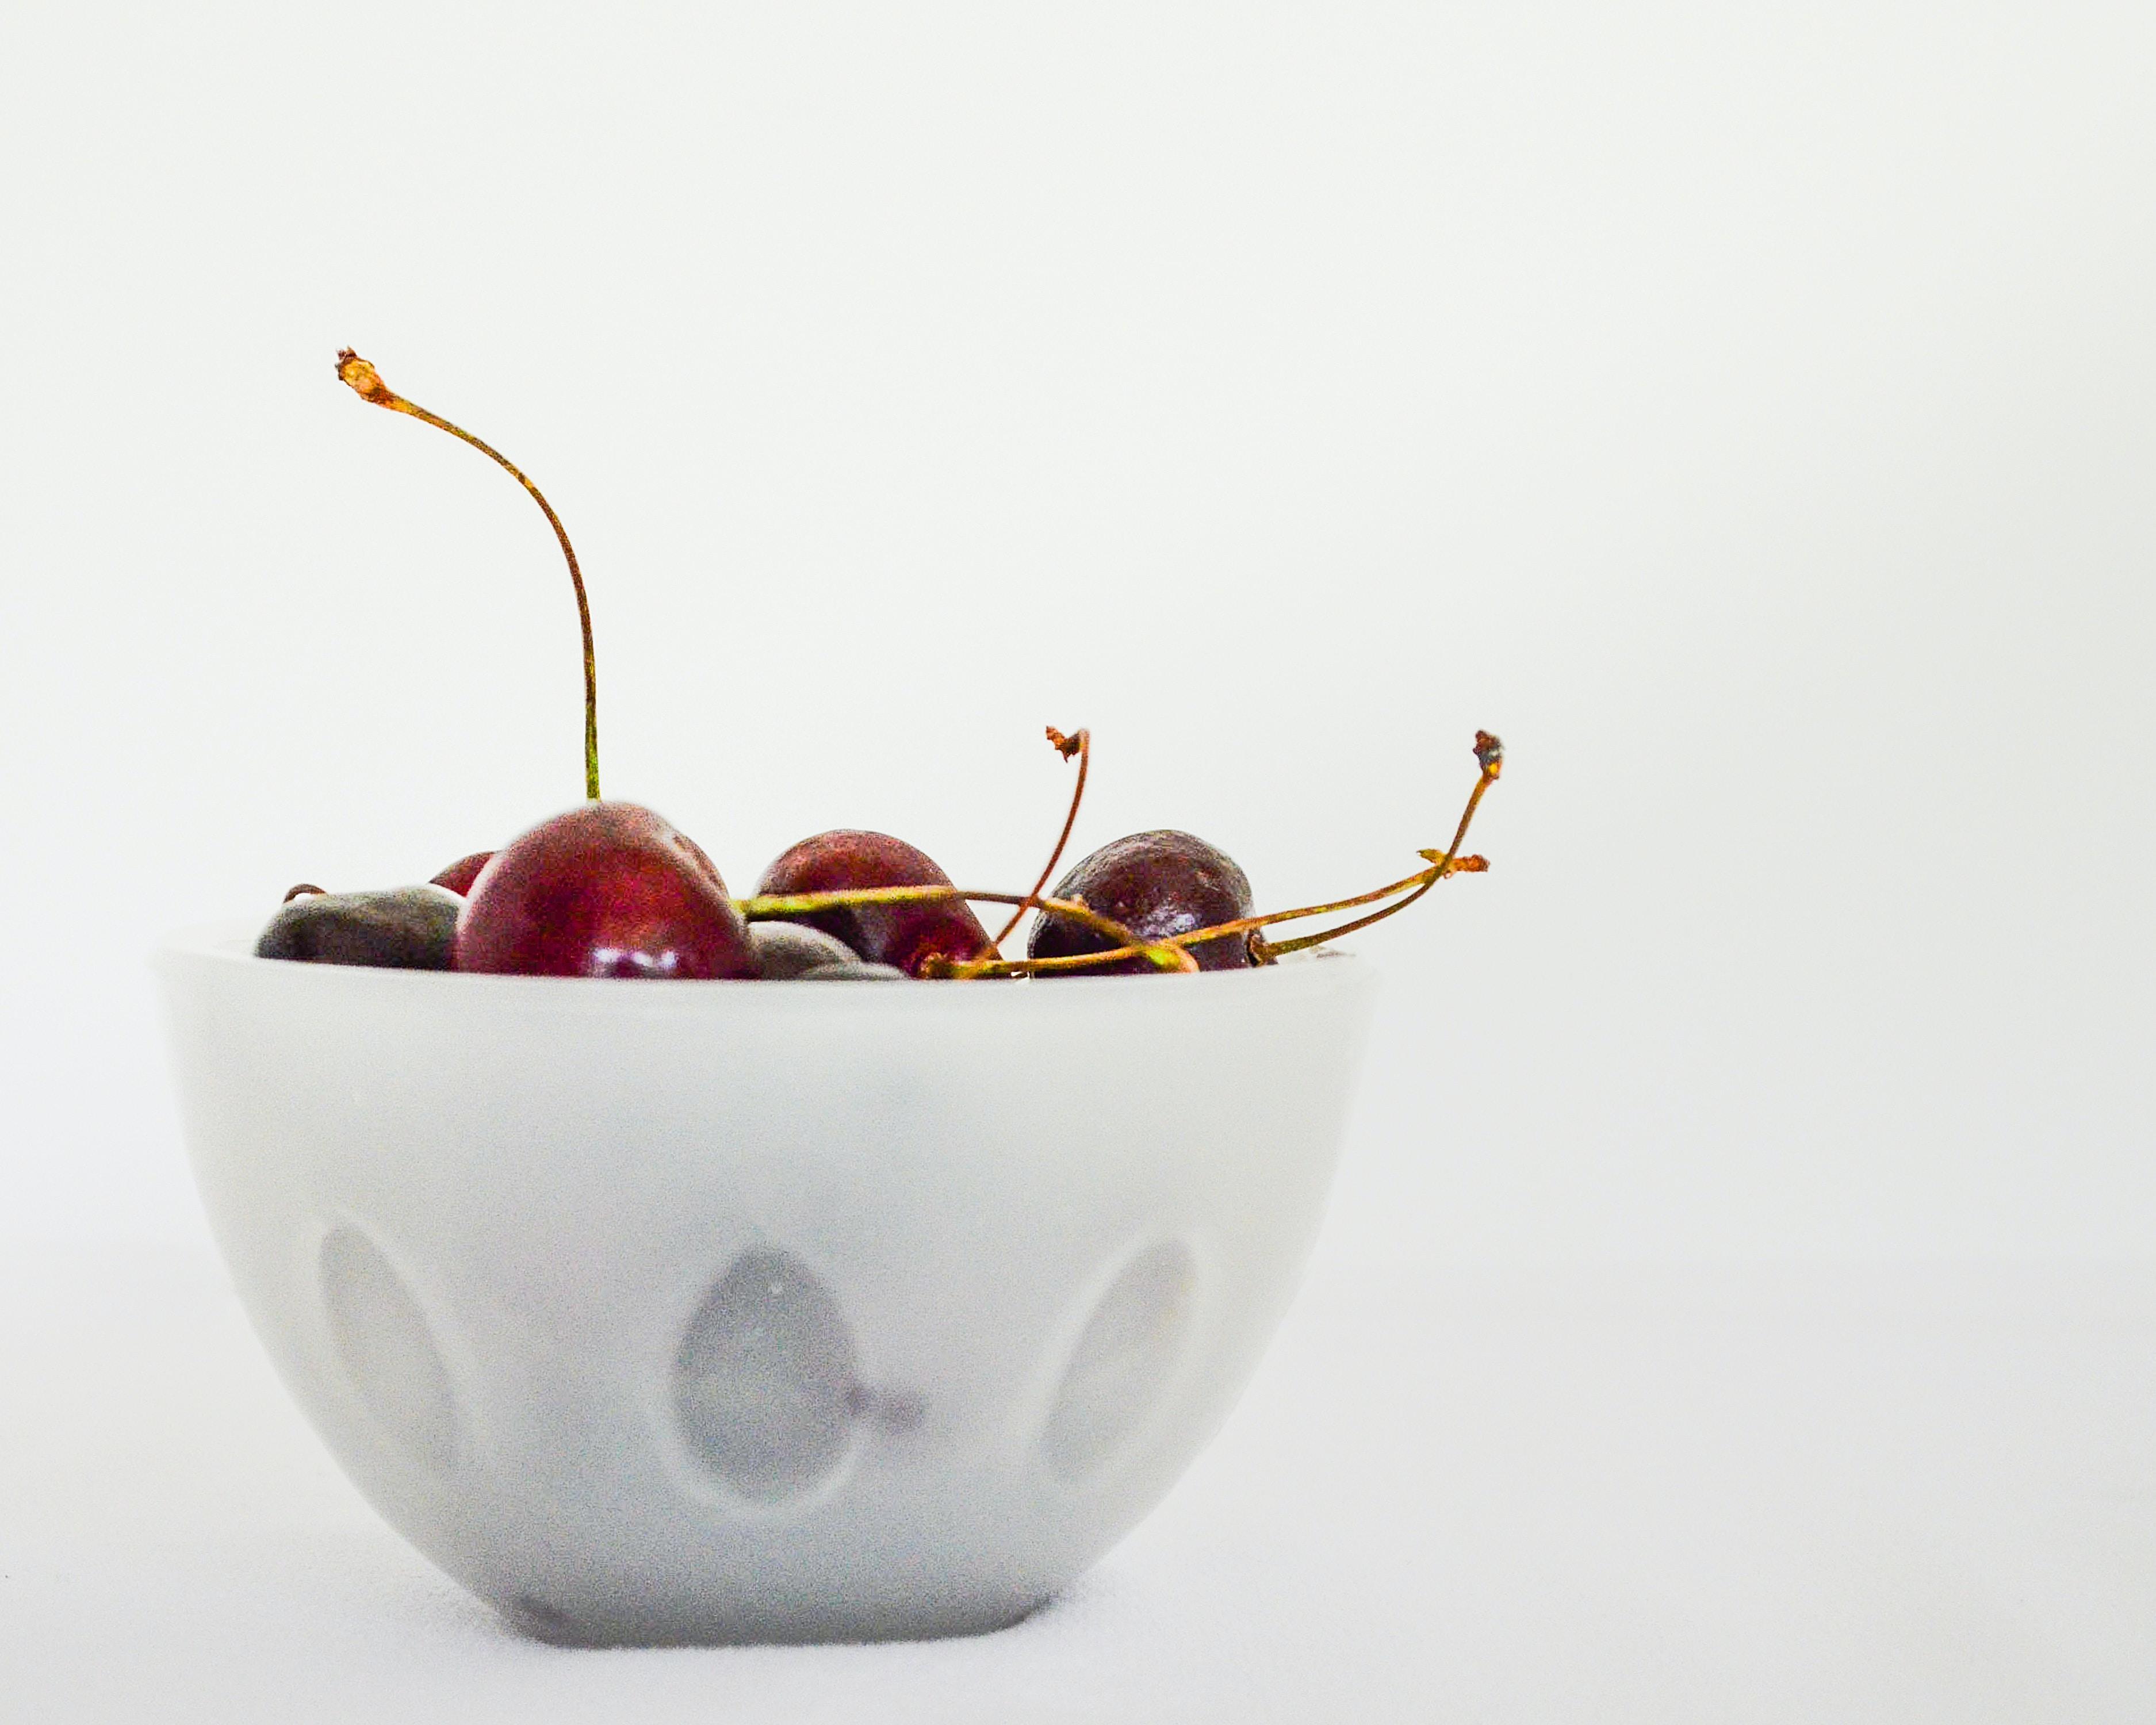 red cherries in white ceramic bowl